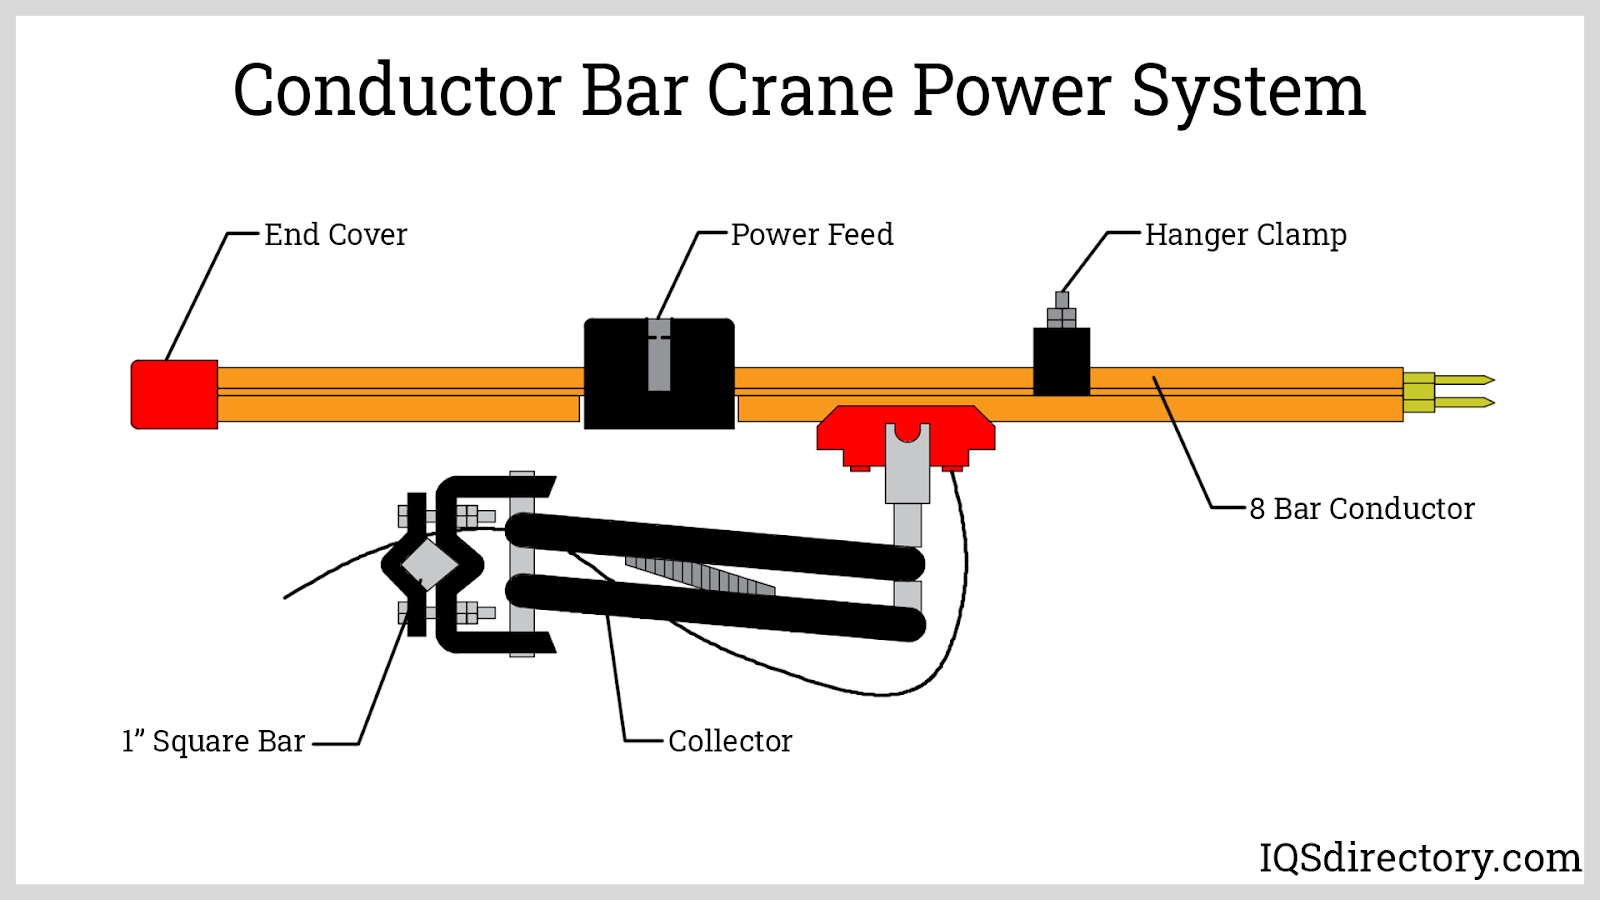 Conductor Bar Crane Power System